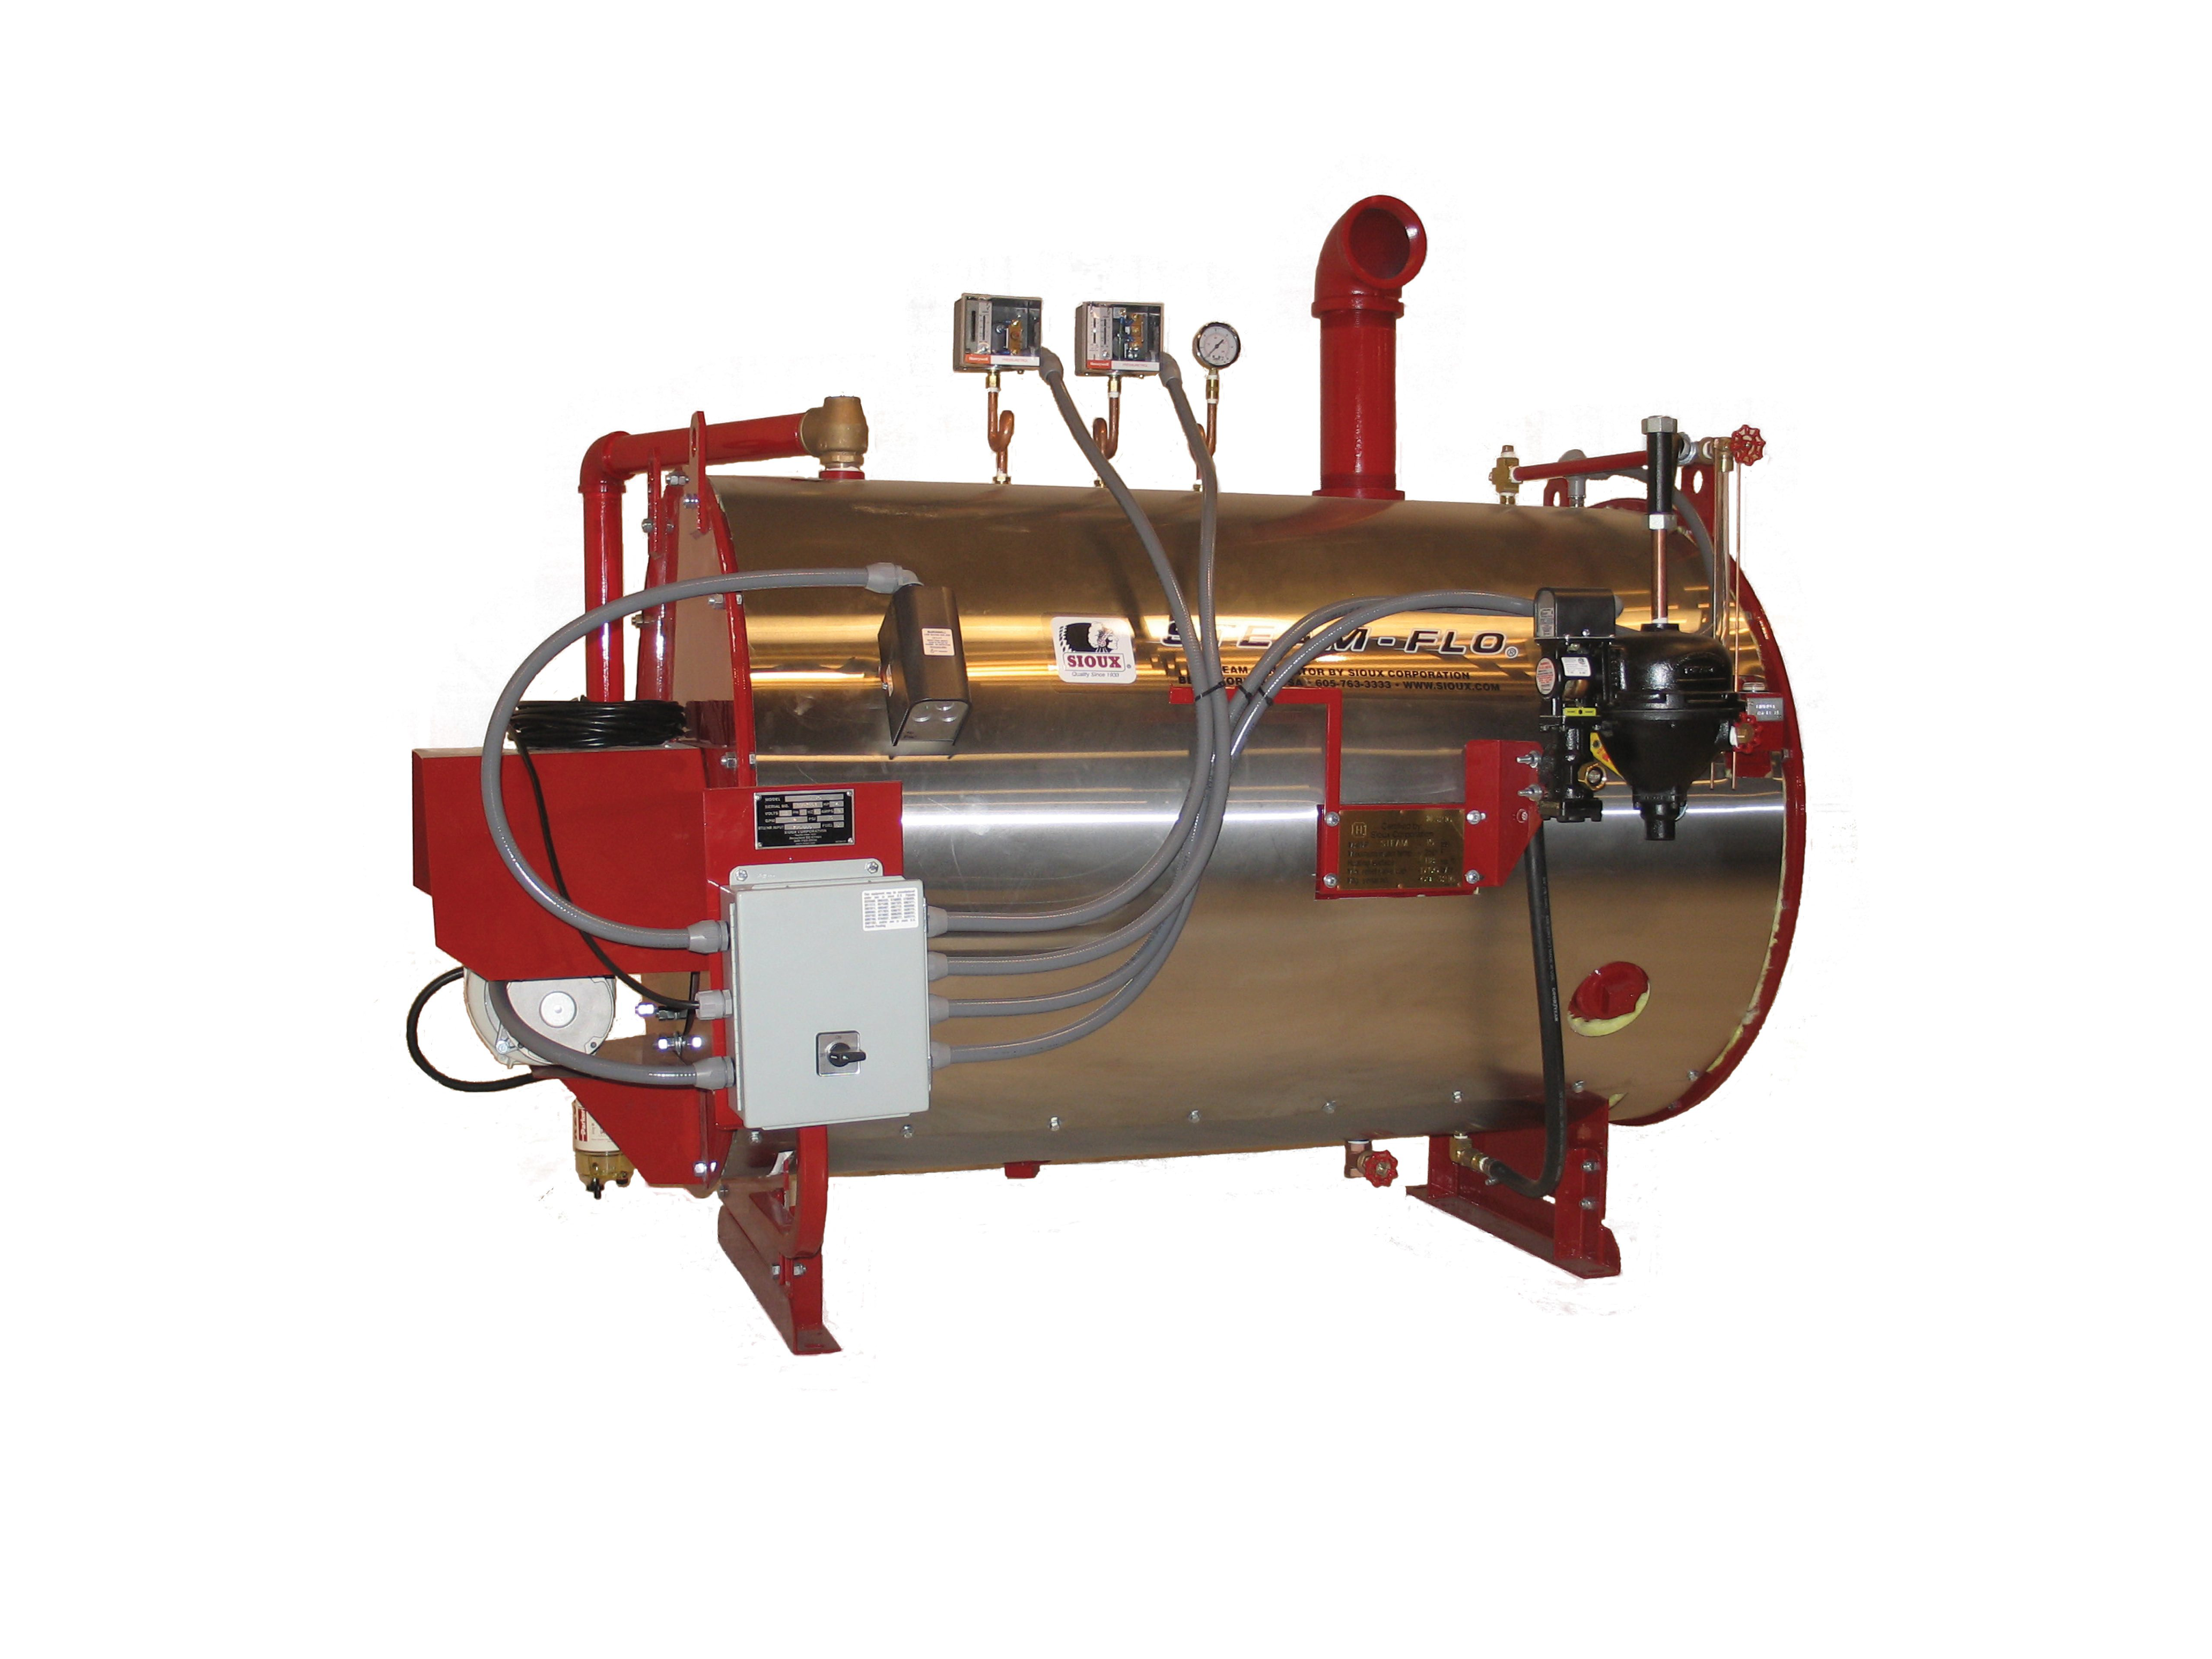 Sioux debuts Steam Flo waste oil burning steam generator